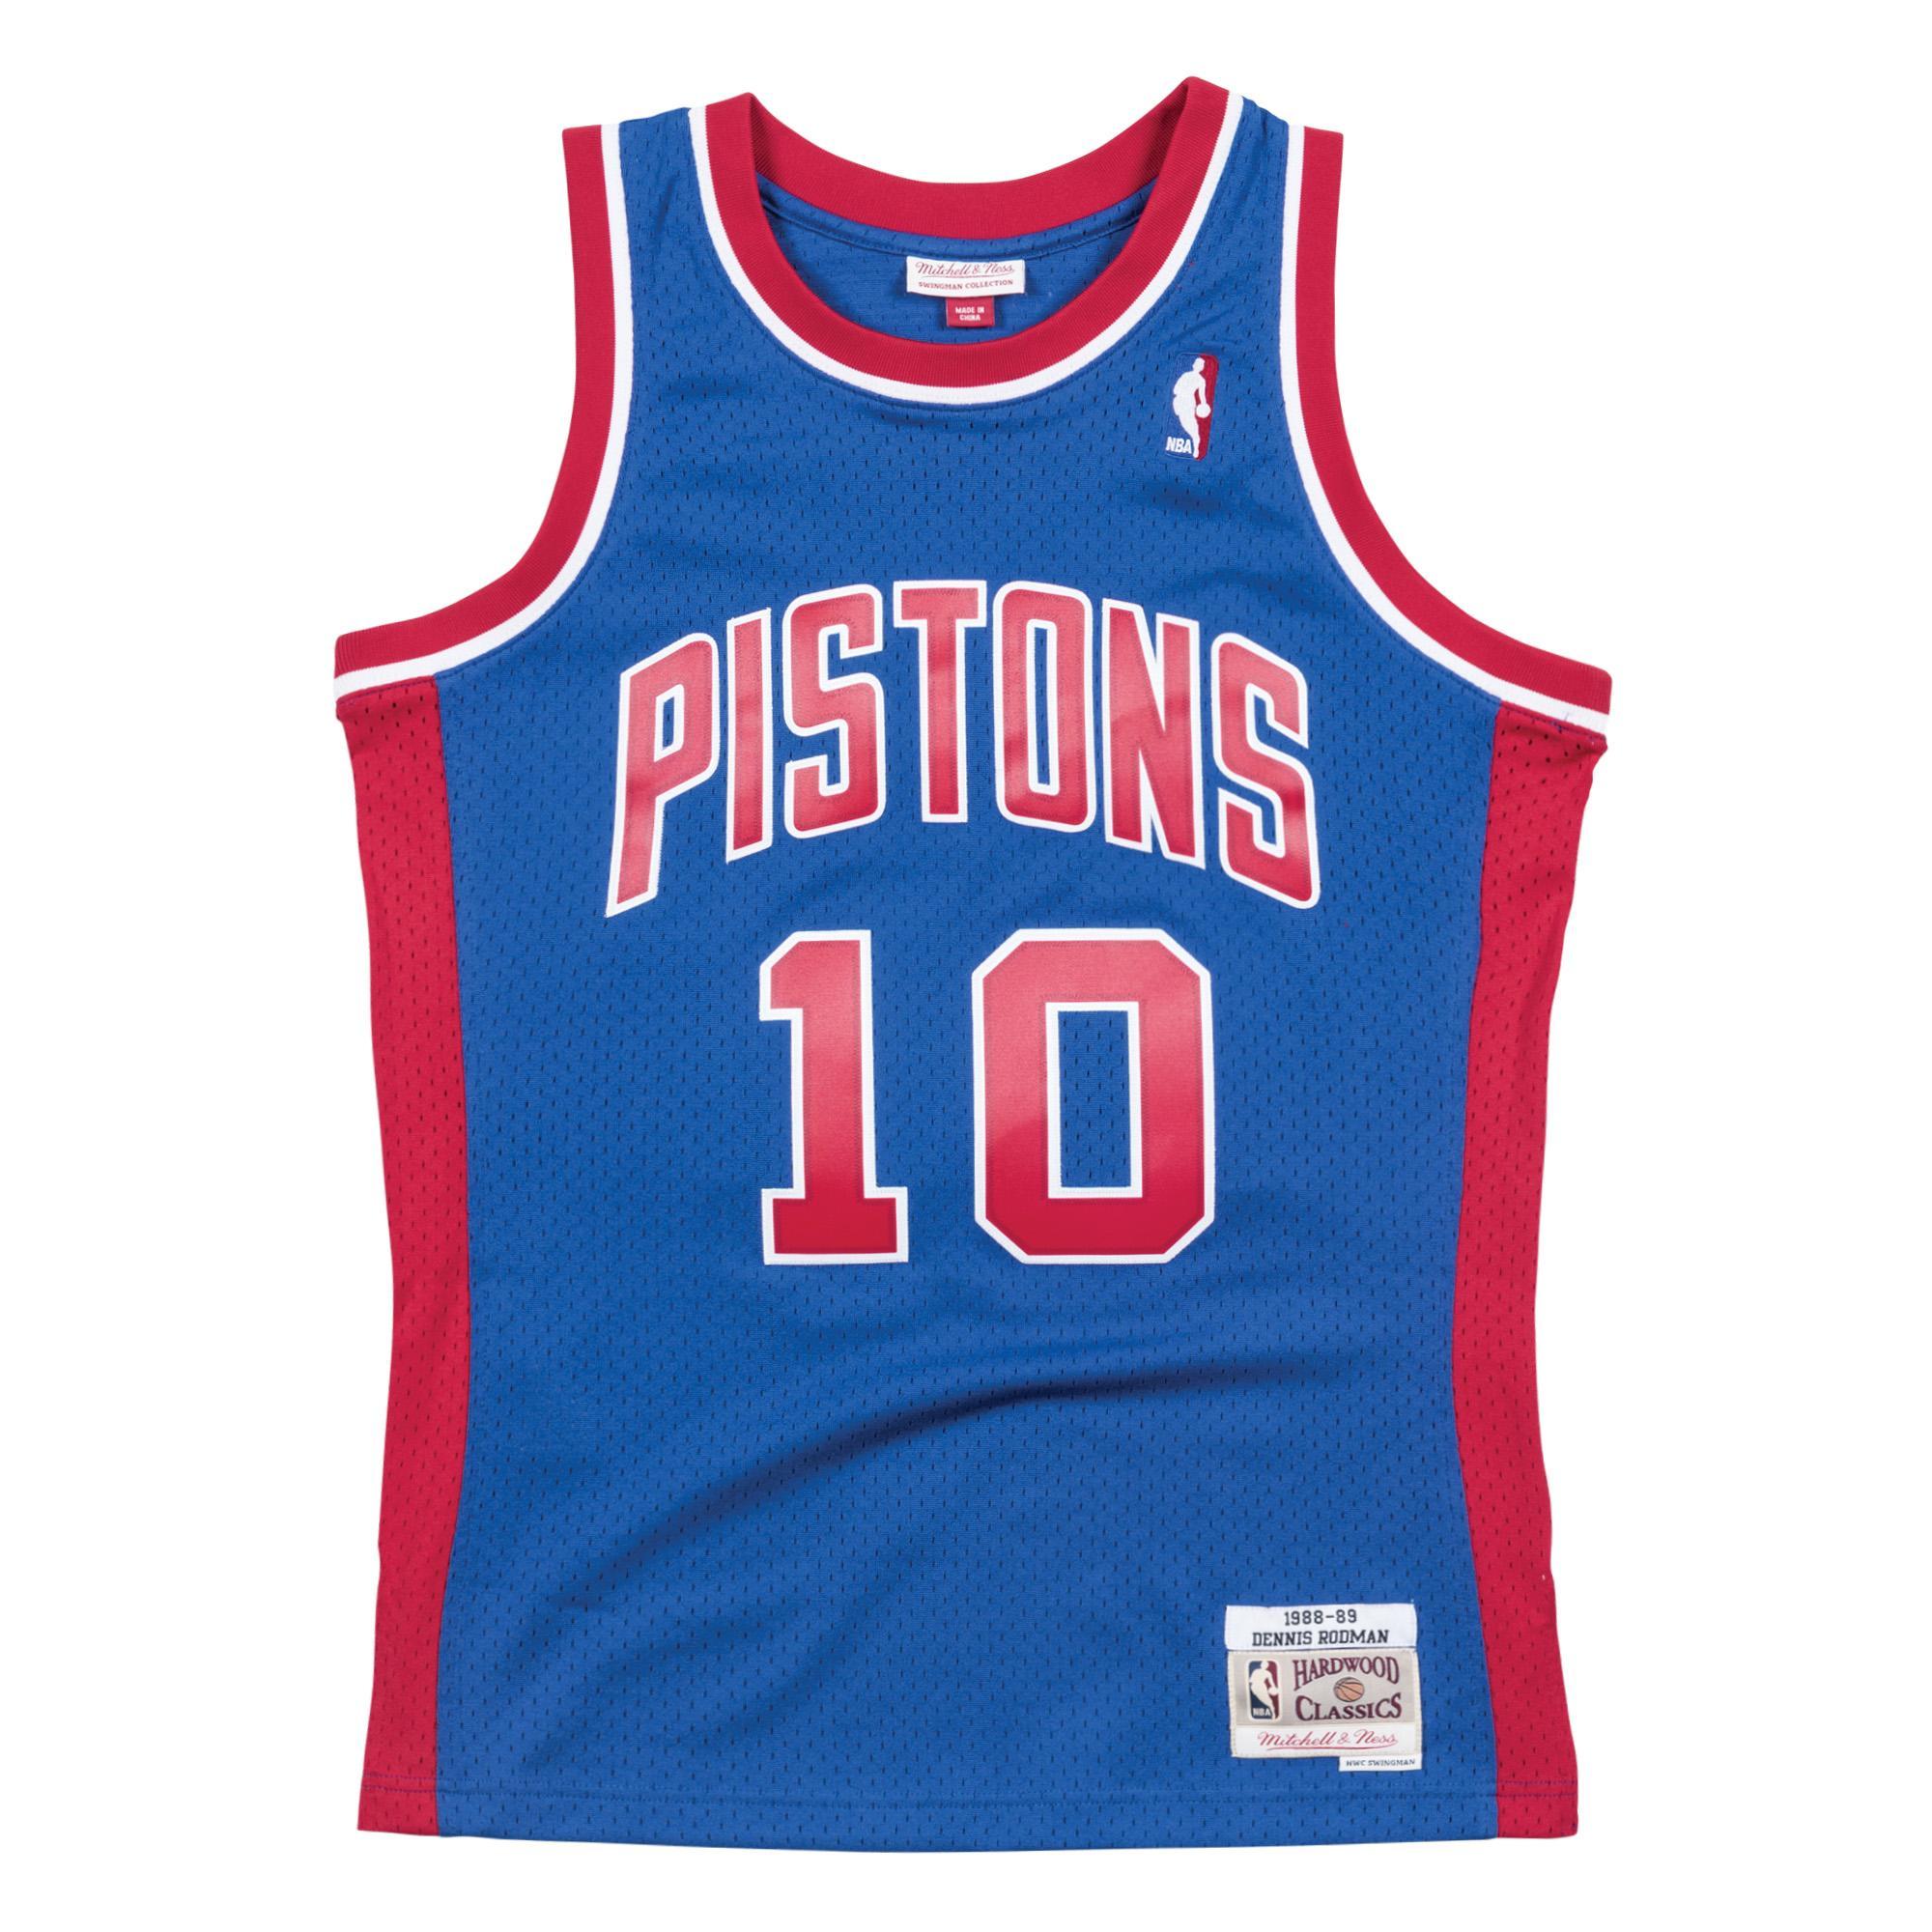 3502735e3bc Dennis Rodman 1988-89 Swingman Jersey Detroit Pistons